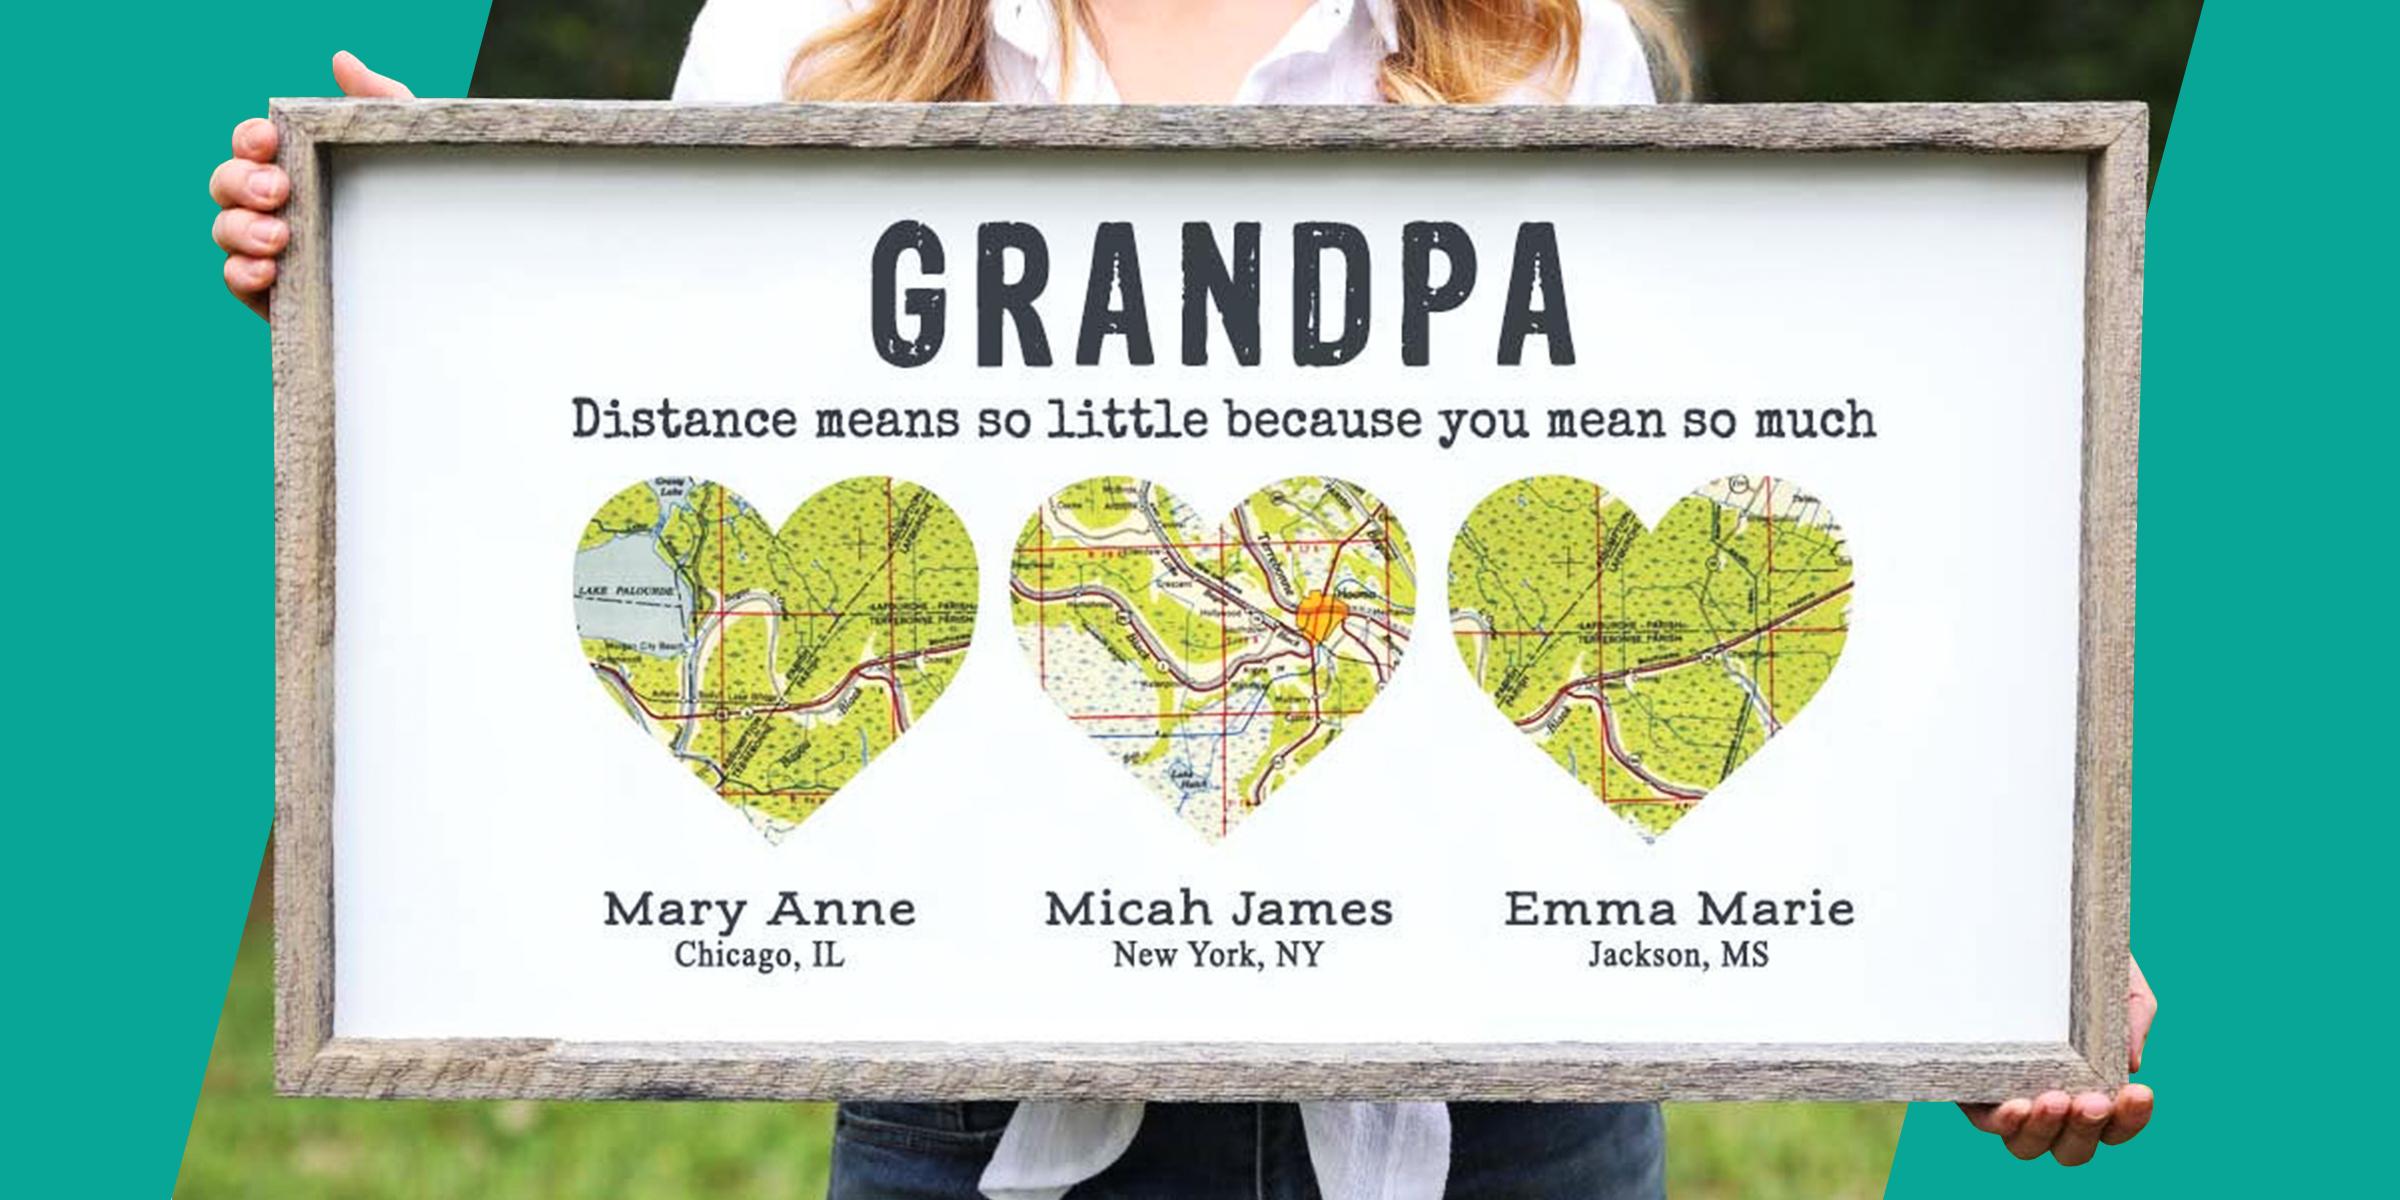 Best Grandpa Ever Fathers Day Gift for Grandpa Fathers Day Photo Frame Fathers Day Gift from Daughter Fathers Day Gift for Grandpa